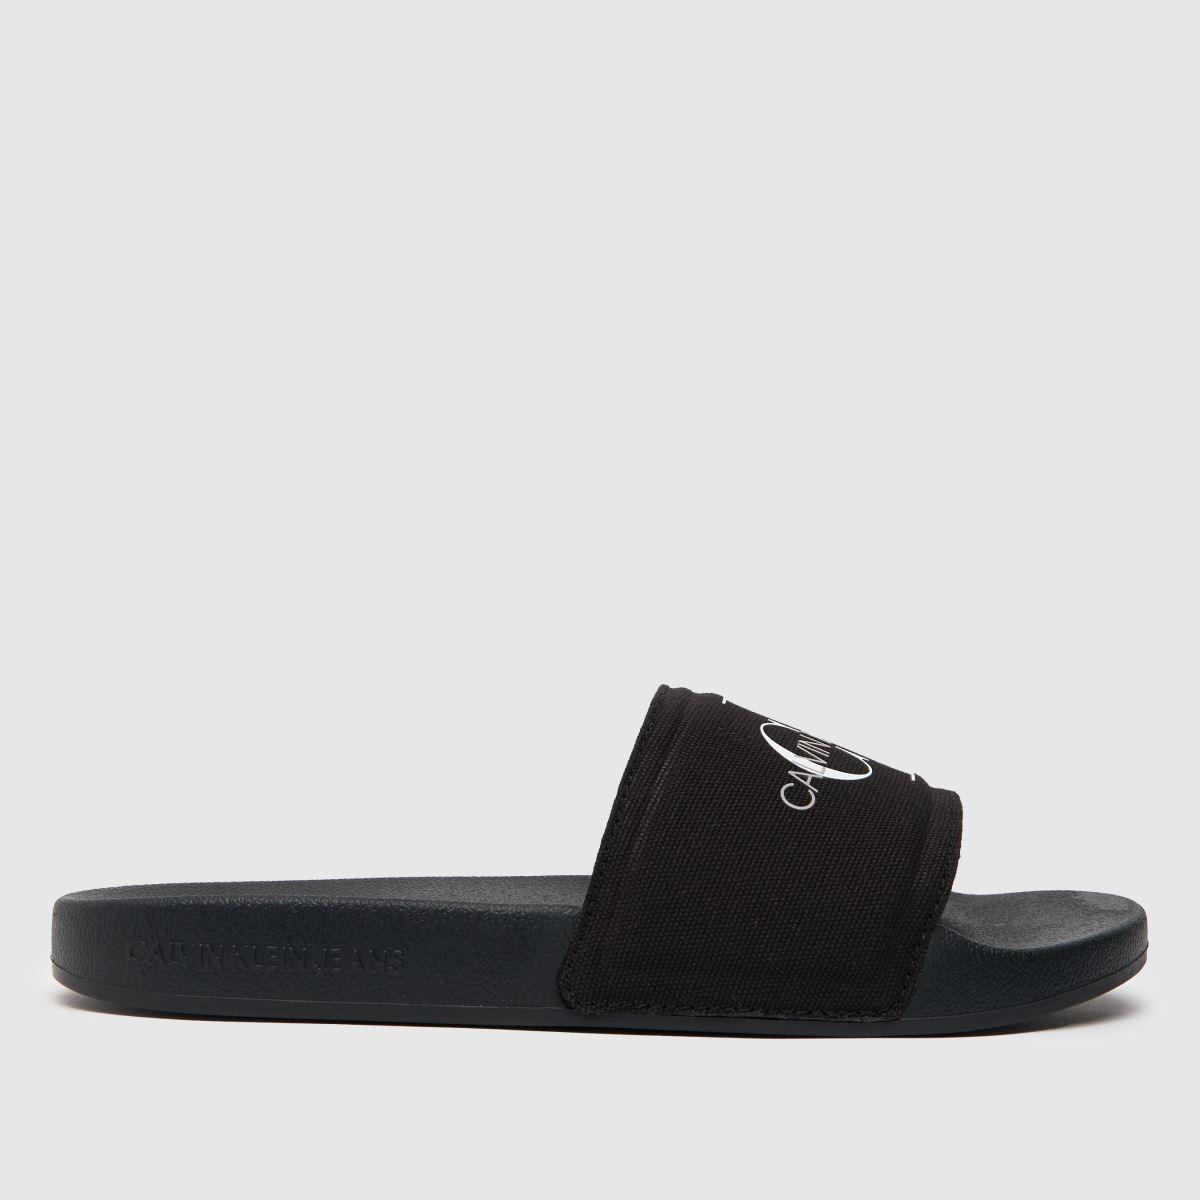 Calvin Klein Black & White Jeans Chantal Heavy Canvas Sandals